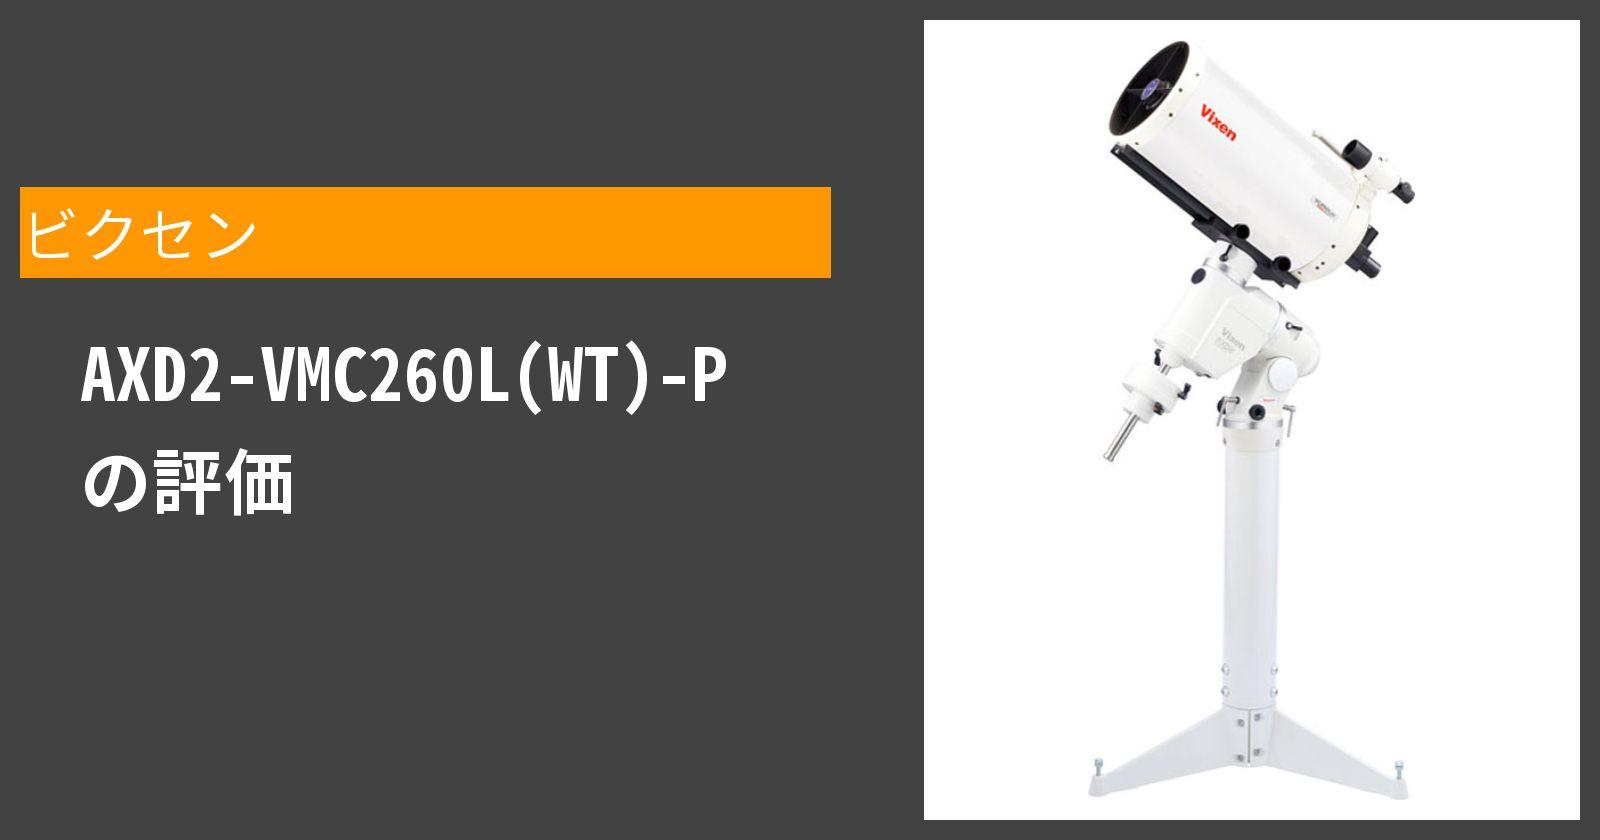 AXD2-VMC260L(WT)-Pを徹底評価